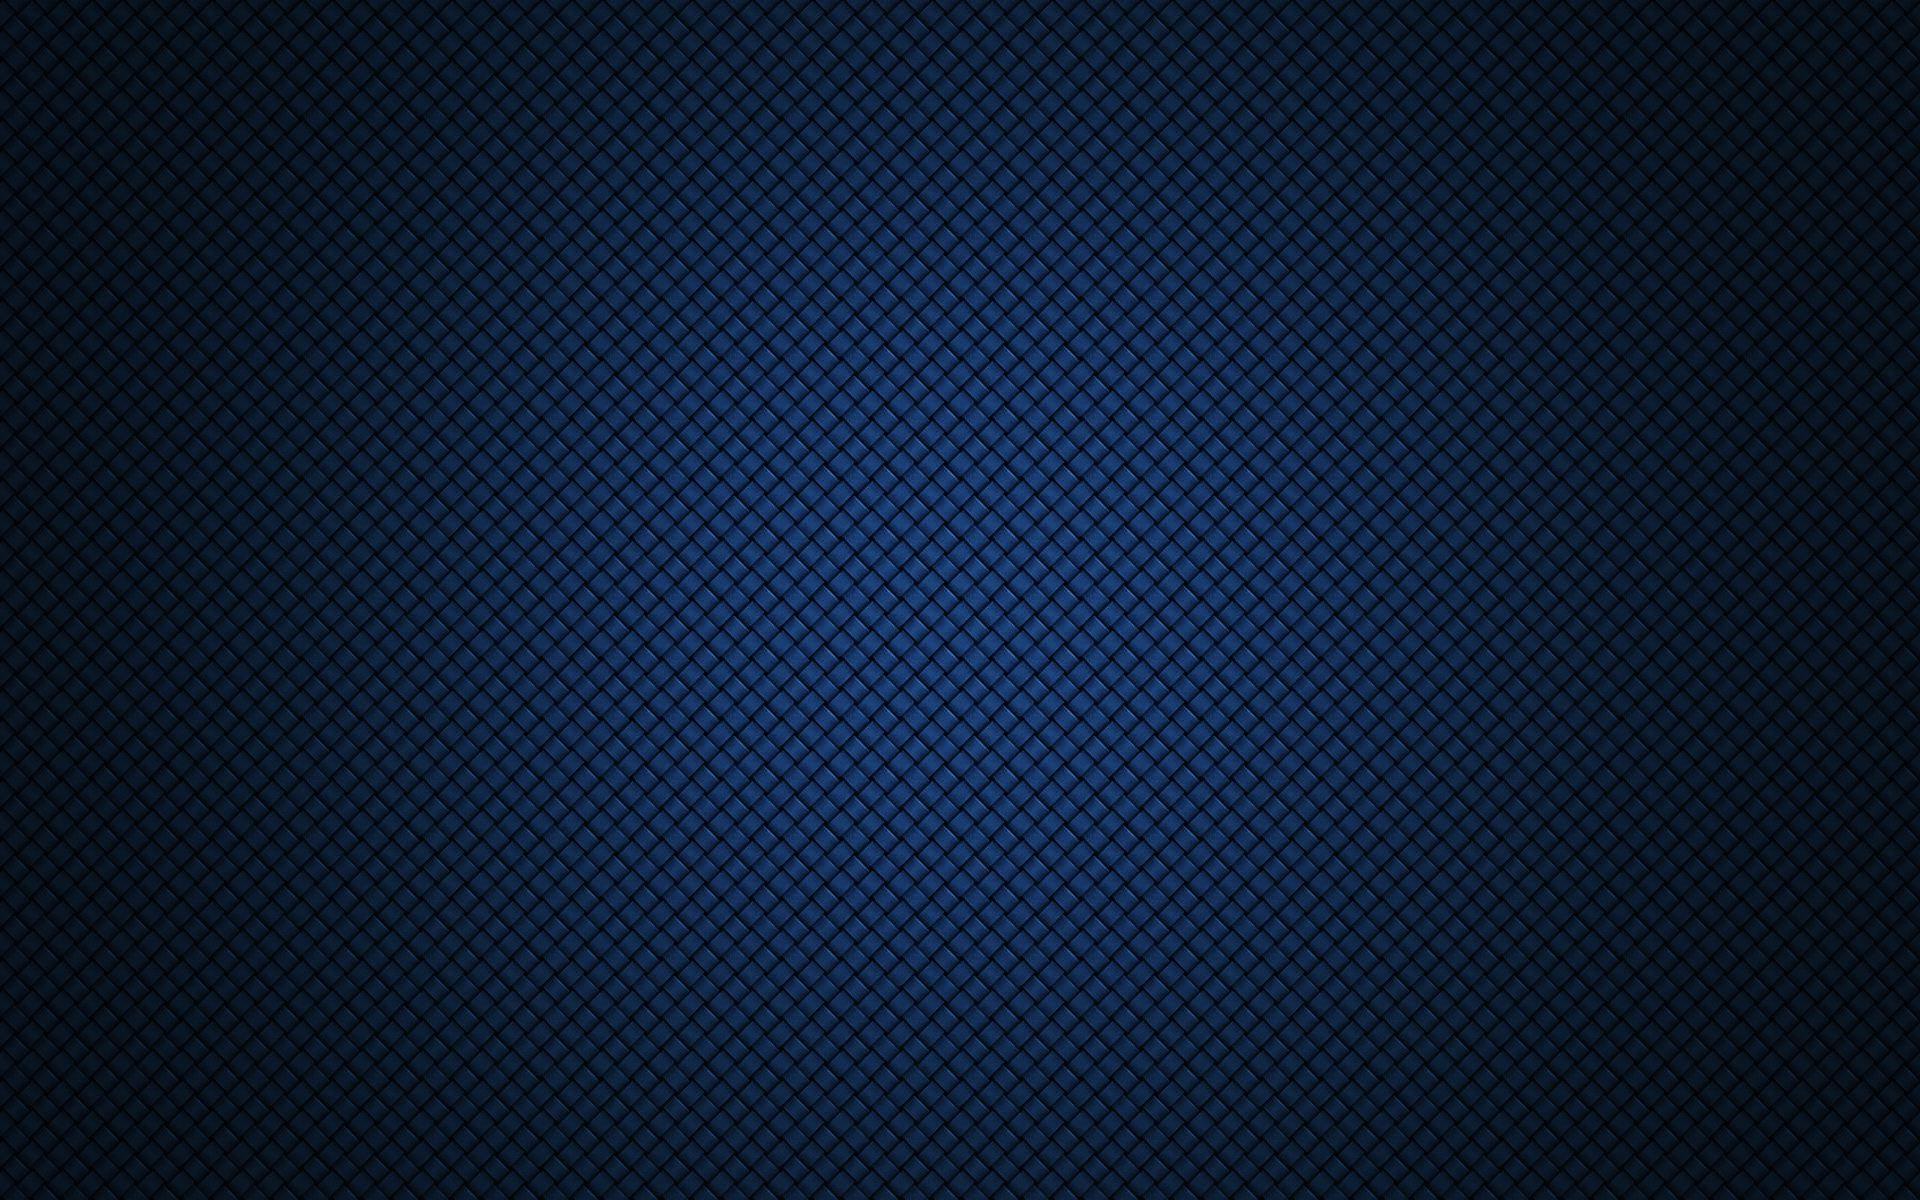 Blue-Hd-Full-HD-p-Best-HD-Blue-HD-wallpaper-wpc5802937